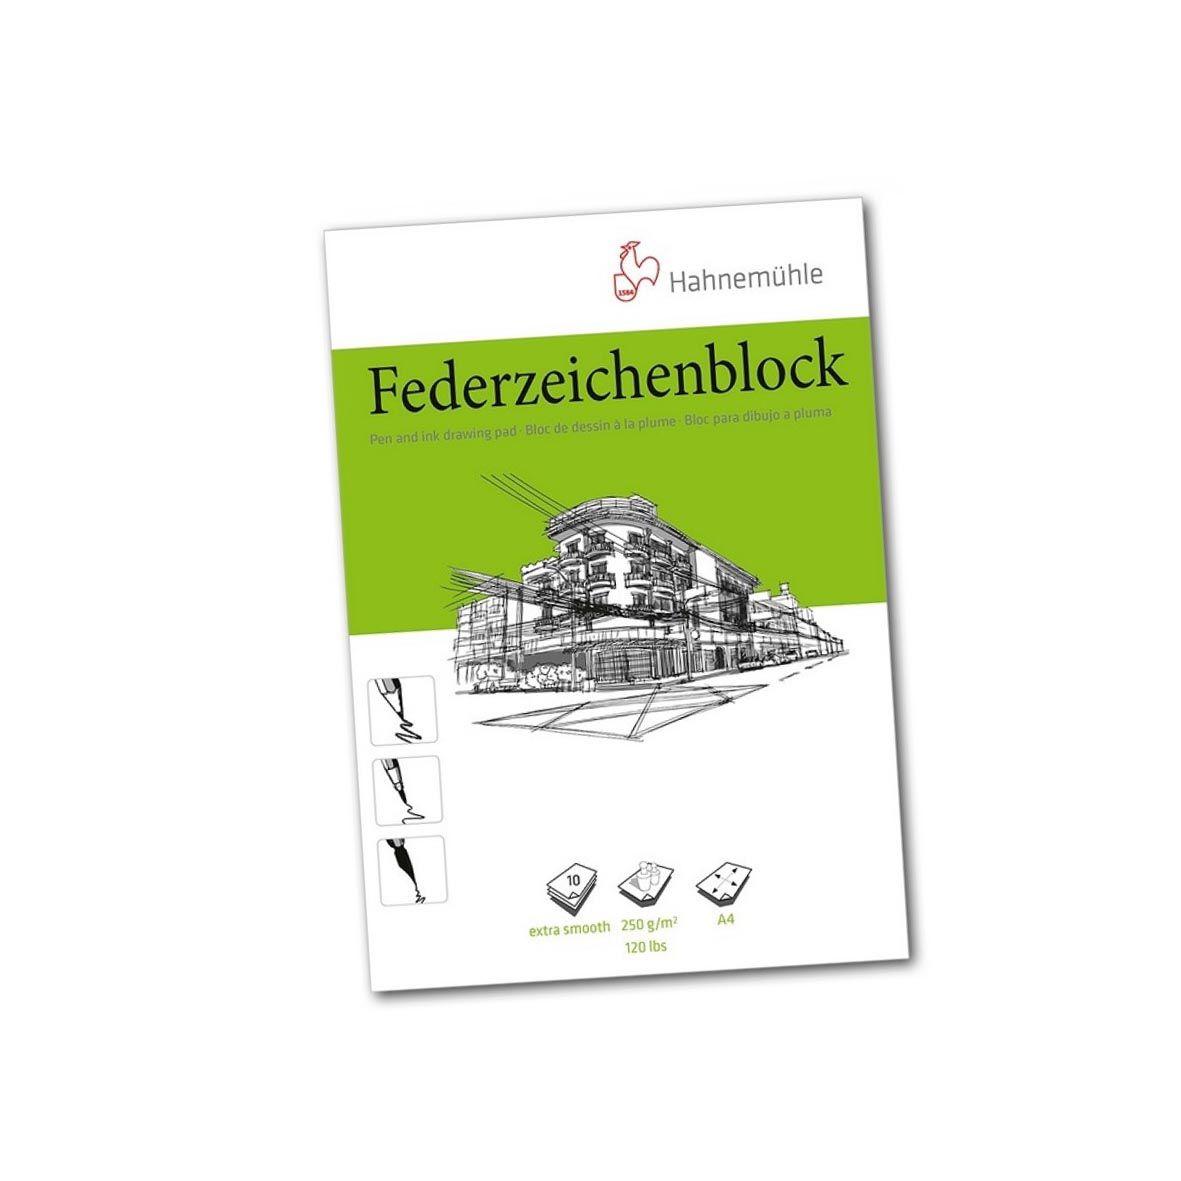 Bloco para desenho Federzeichen 250g/m2 A4 10 folhas  Hahnemuhle